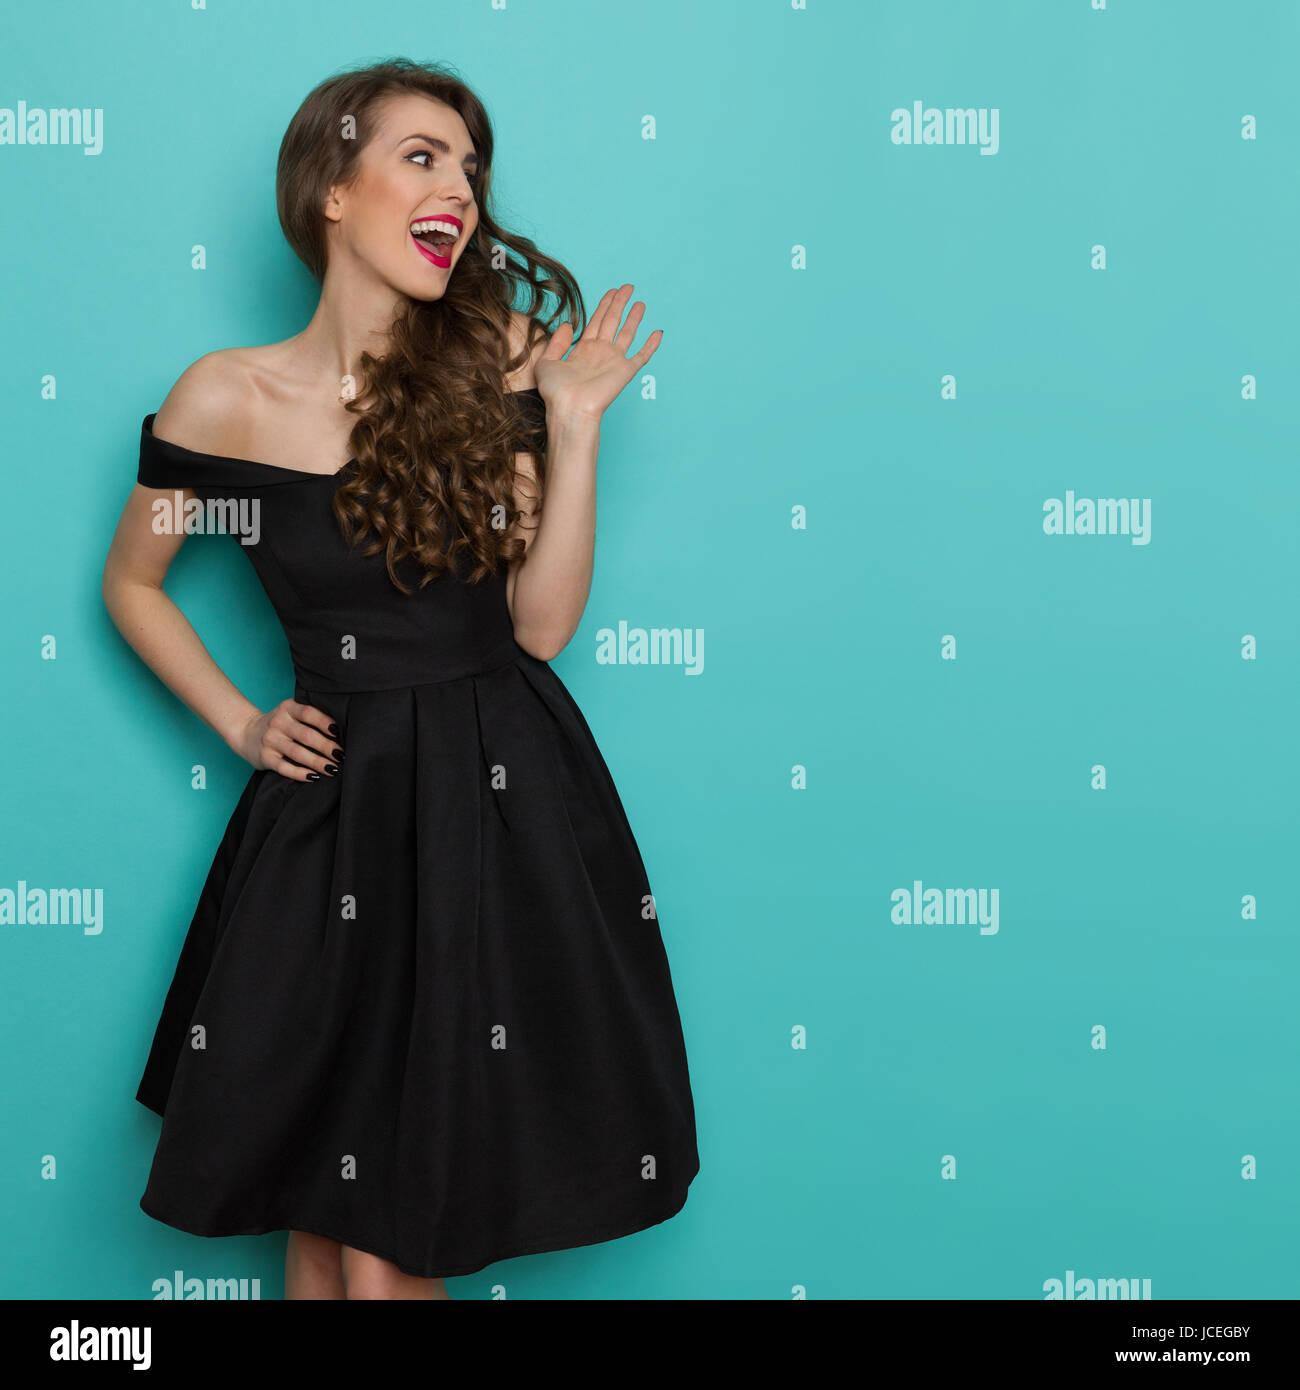 Waving Hand Stockfotos & Waving Hand Bilder - Alamy